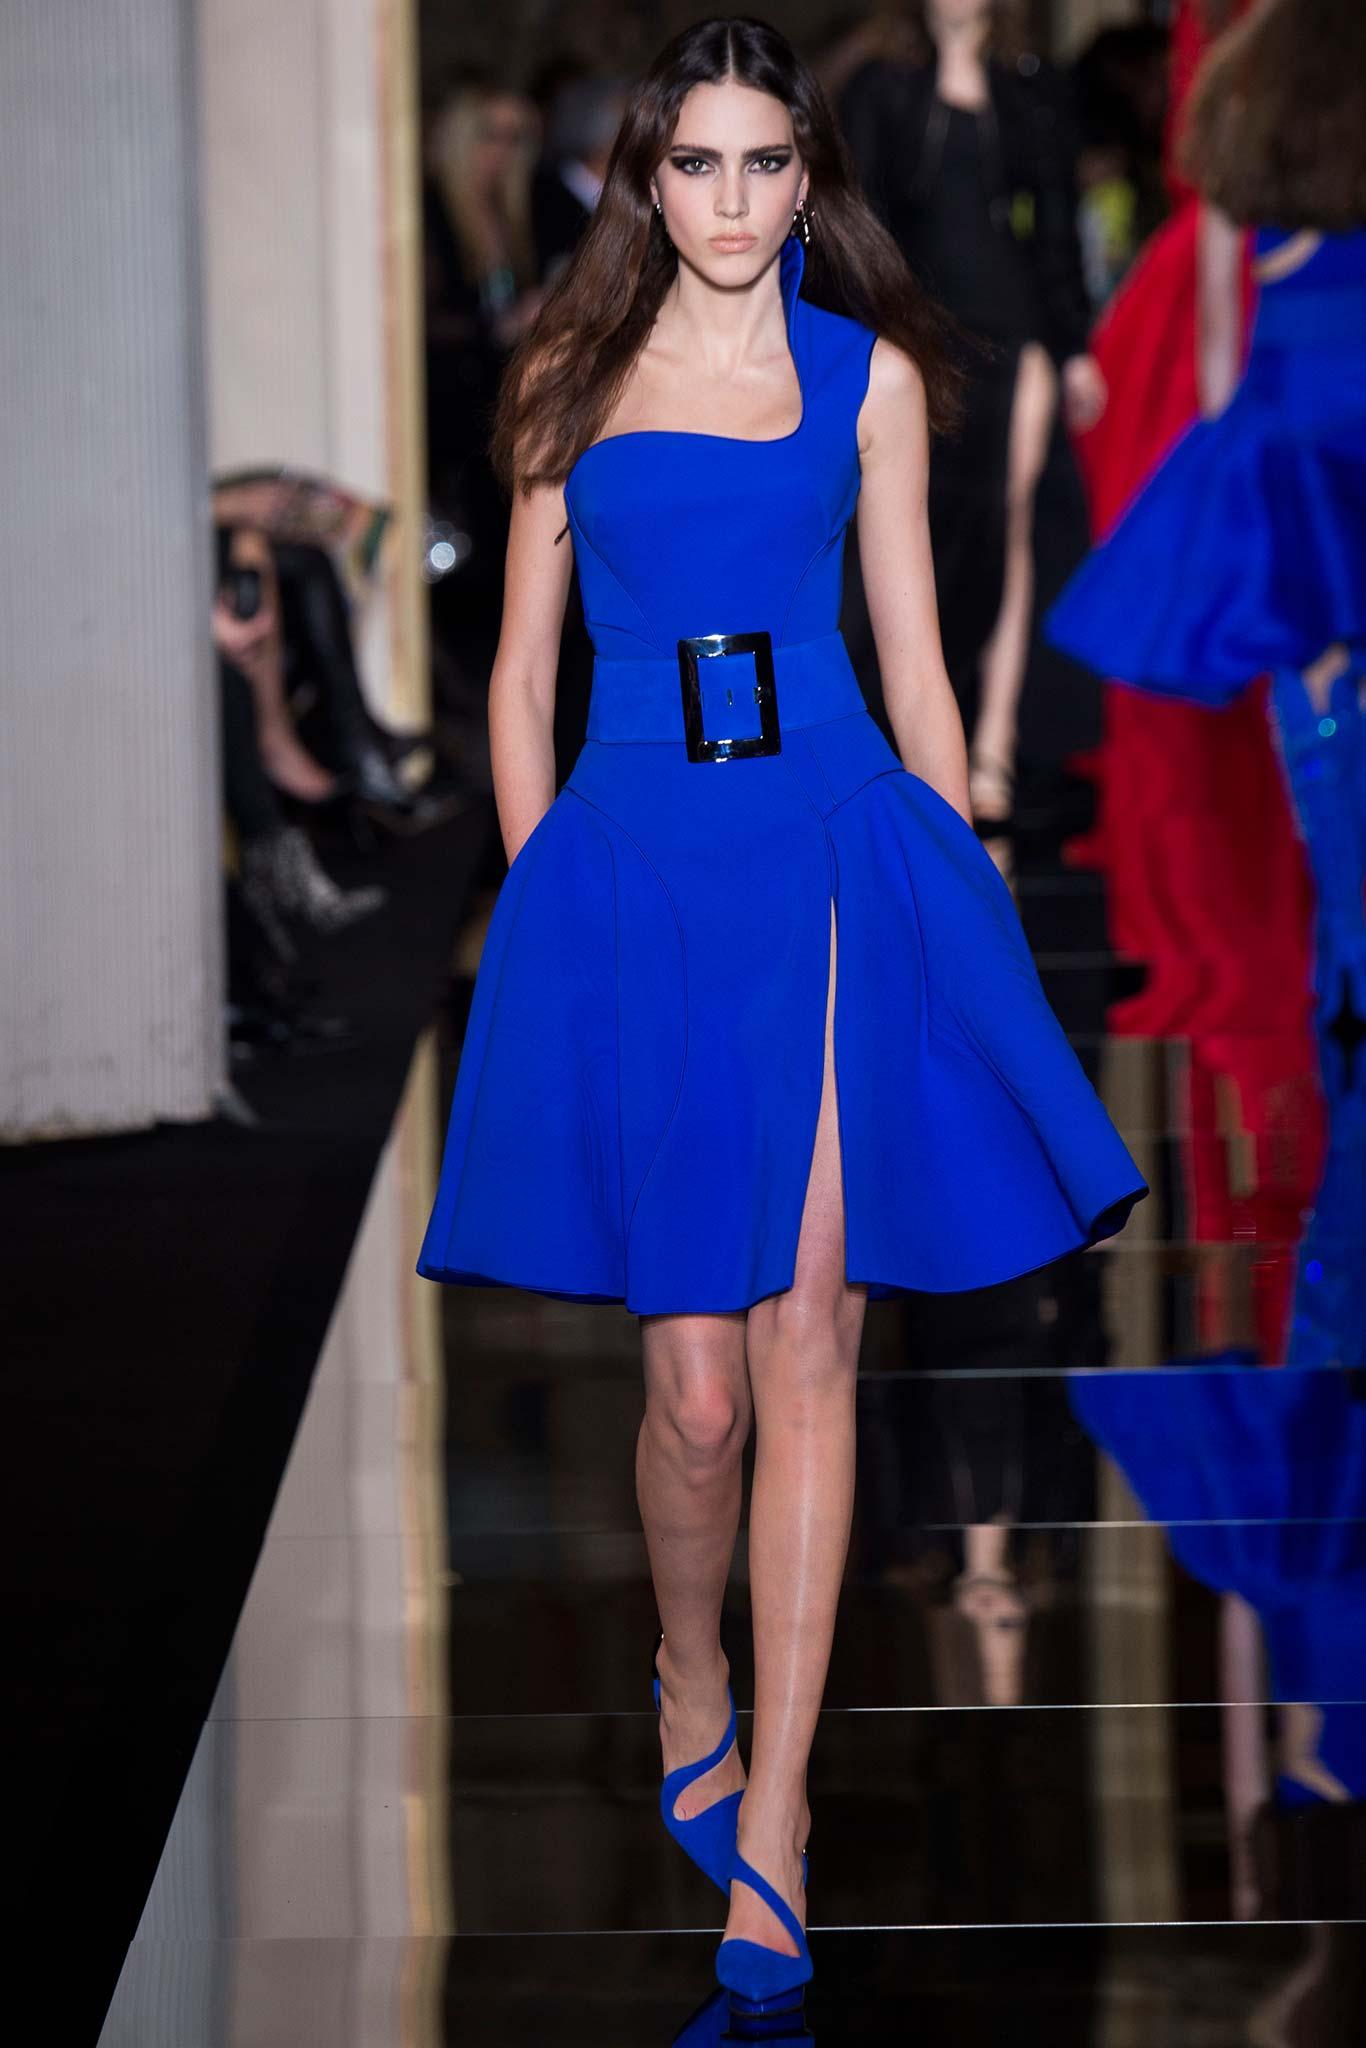 Atelier Versace Haute Couture 2015 Самые носибельные образы с Недели моды haute couture в Париже